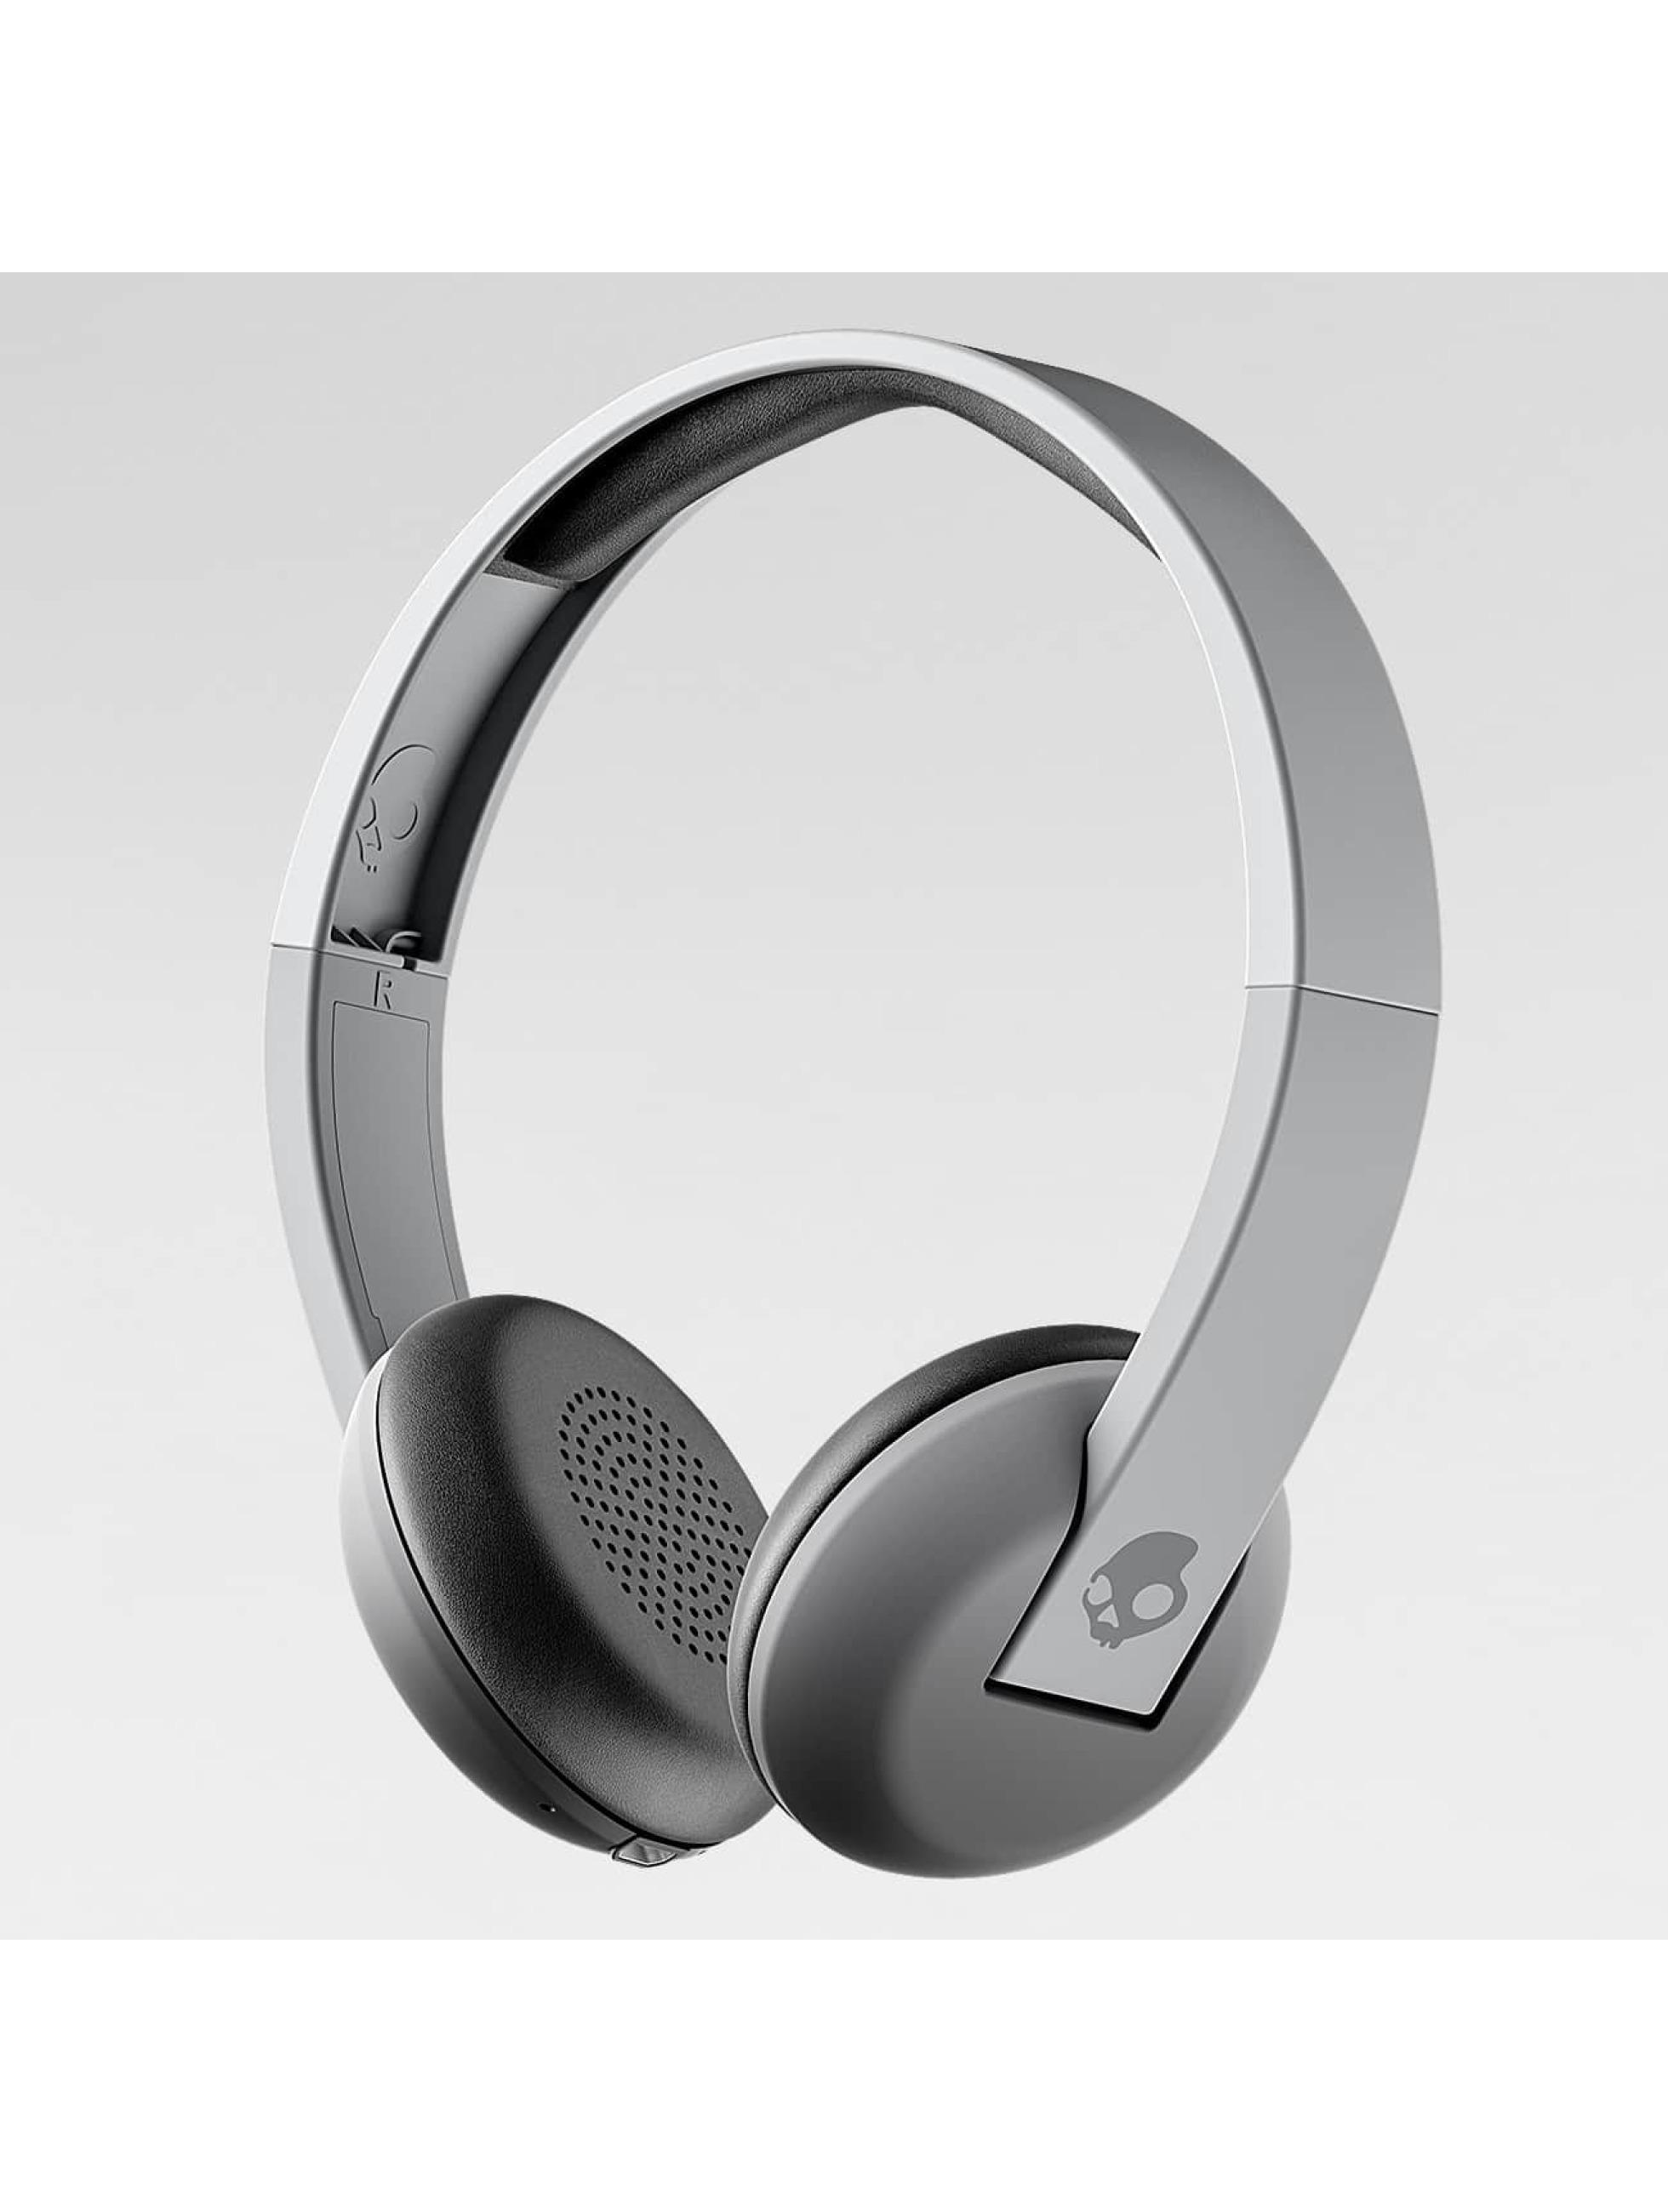 Skullcandy Männer,Frauen Kopfhörer Uproar Wireless On Ear in grau